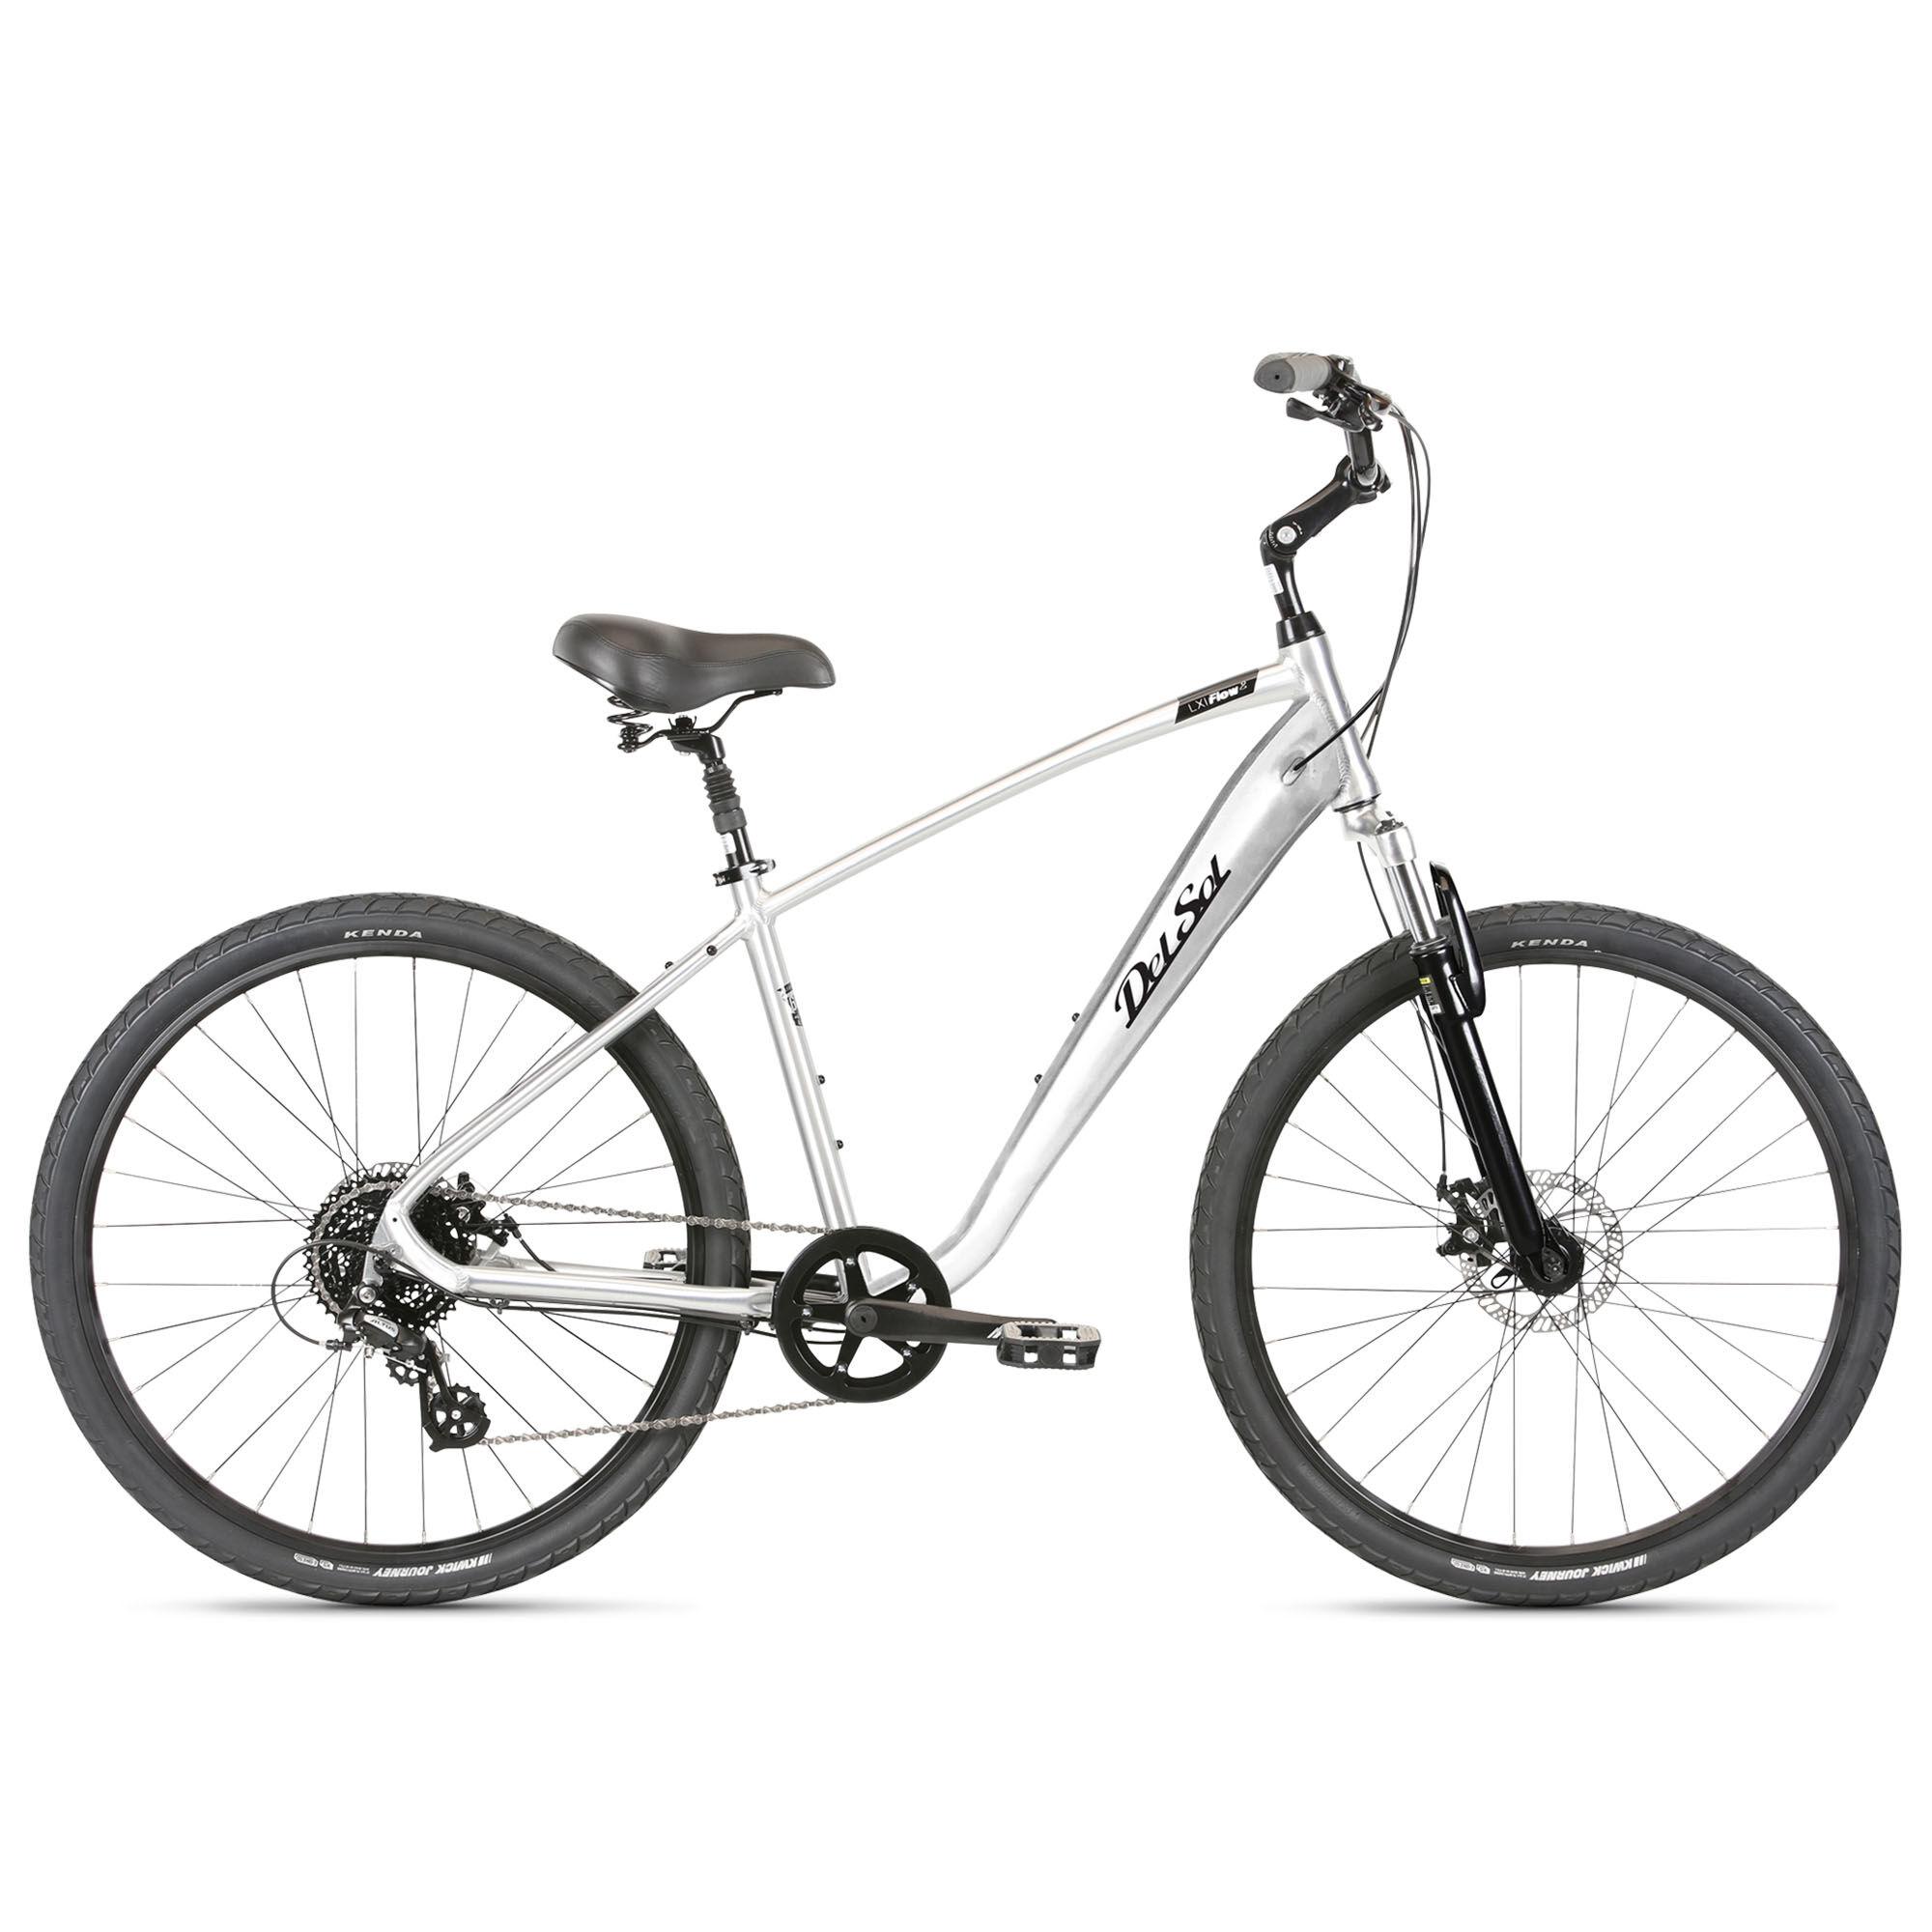 Del Sol Men's LXI Flow 2 Comfort Bike '21  - Brushed Alloy - Size: Large